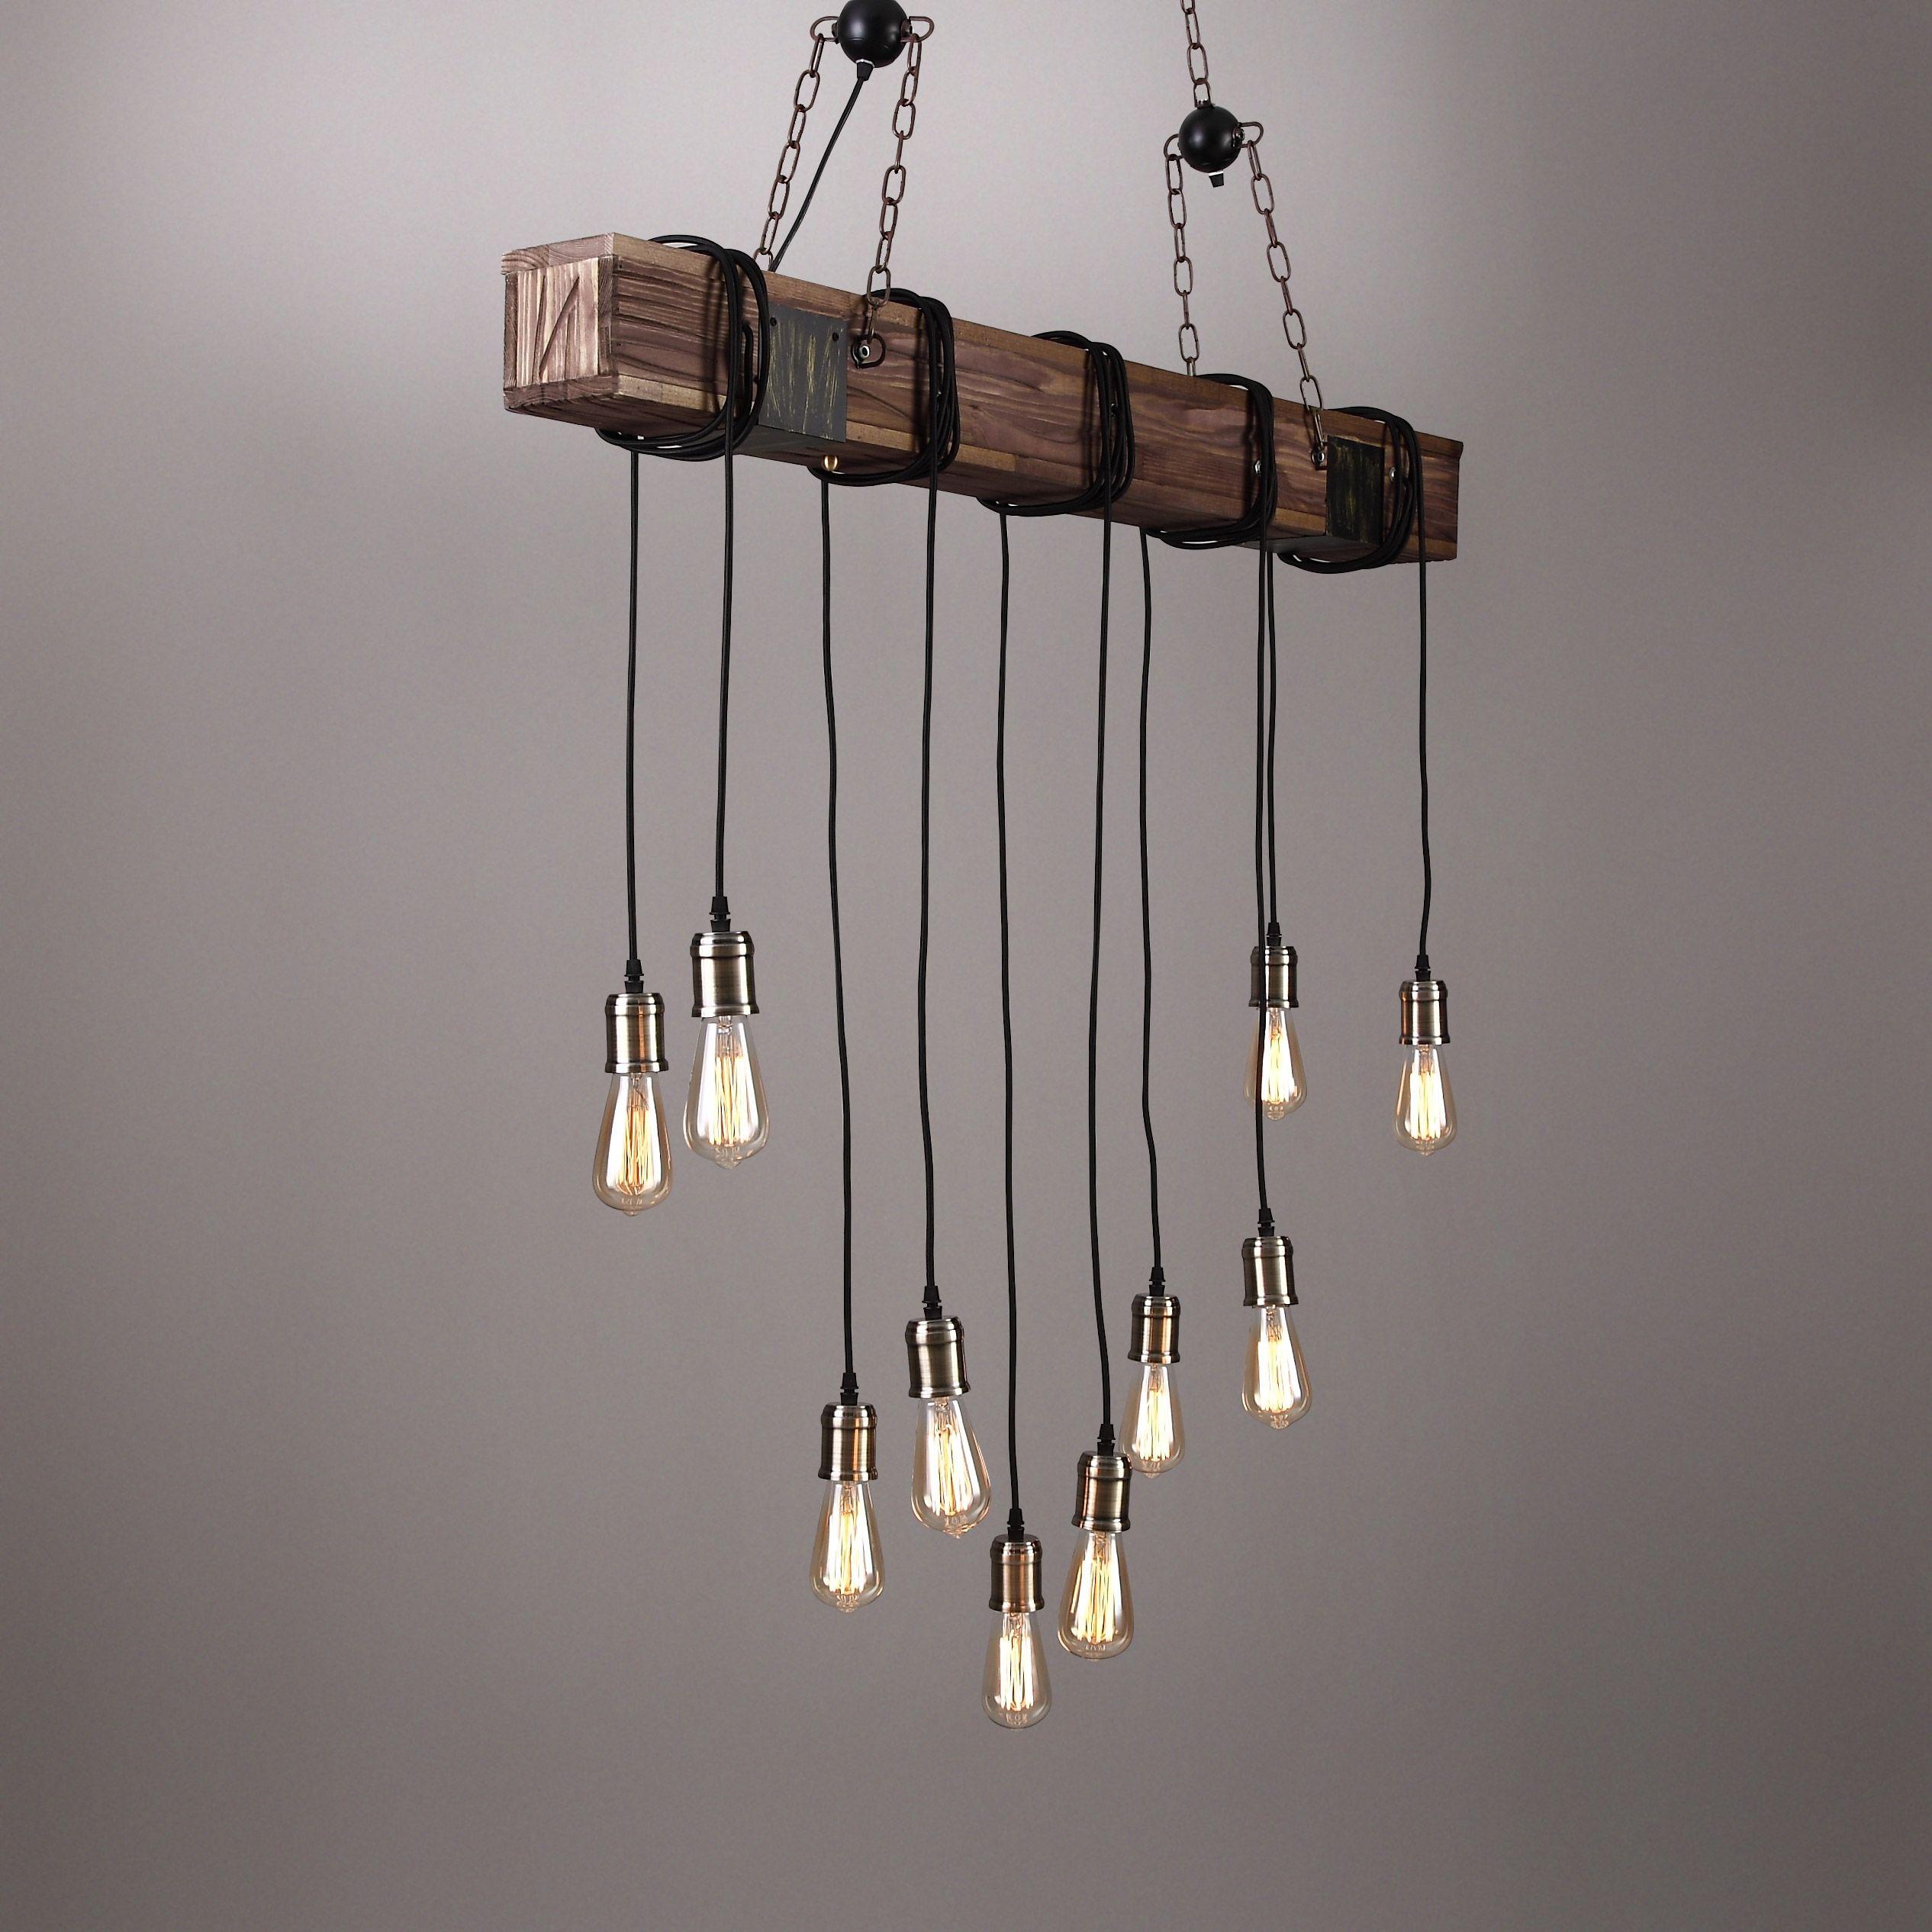 Farmhouse Style Dark Distressed Wood Beam Large Linear Island Pendant Light 10 Edison Bulbs